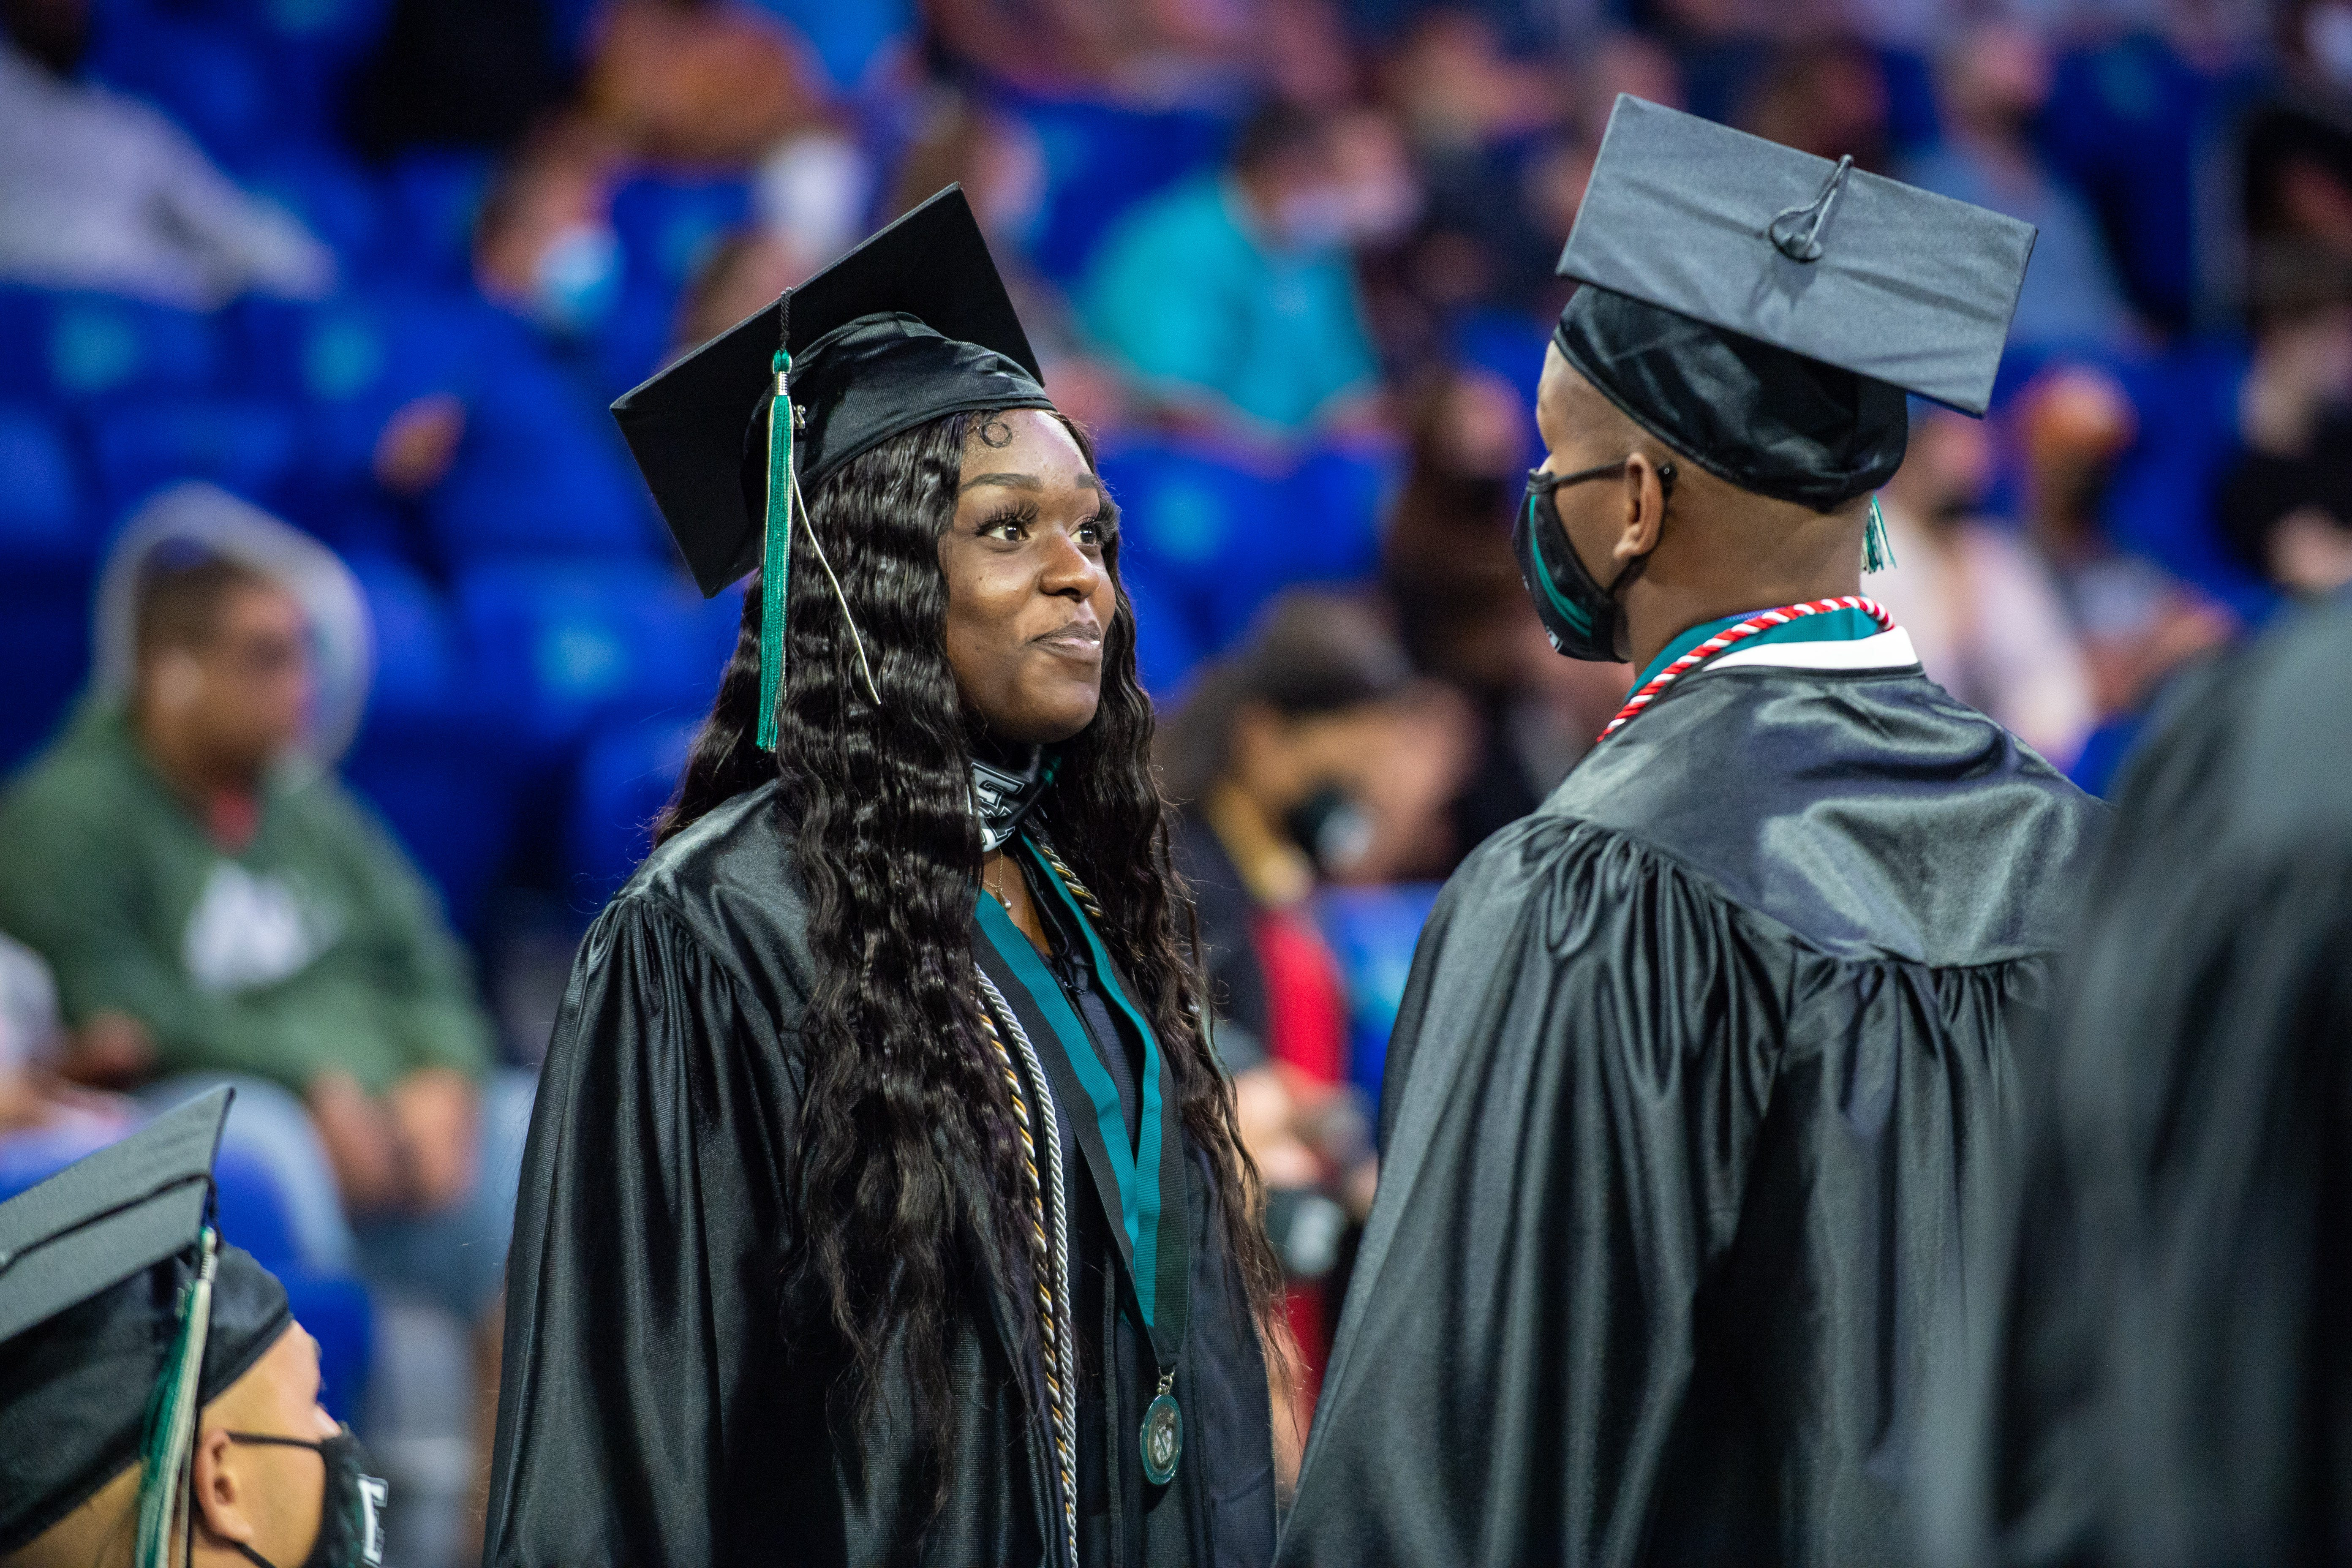 Graduation 2021: East Lee County High School 3